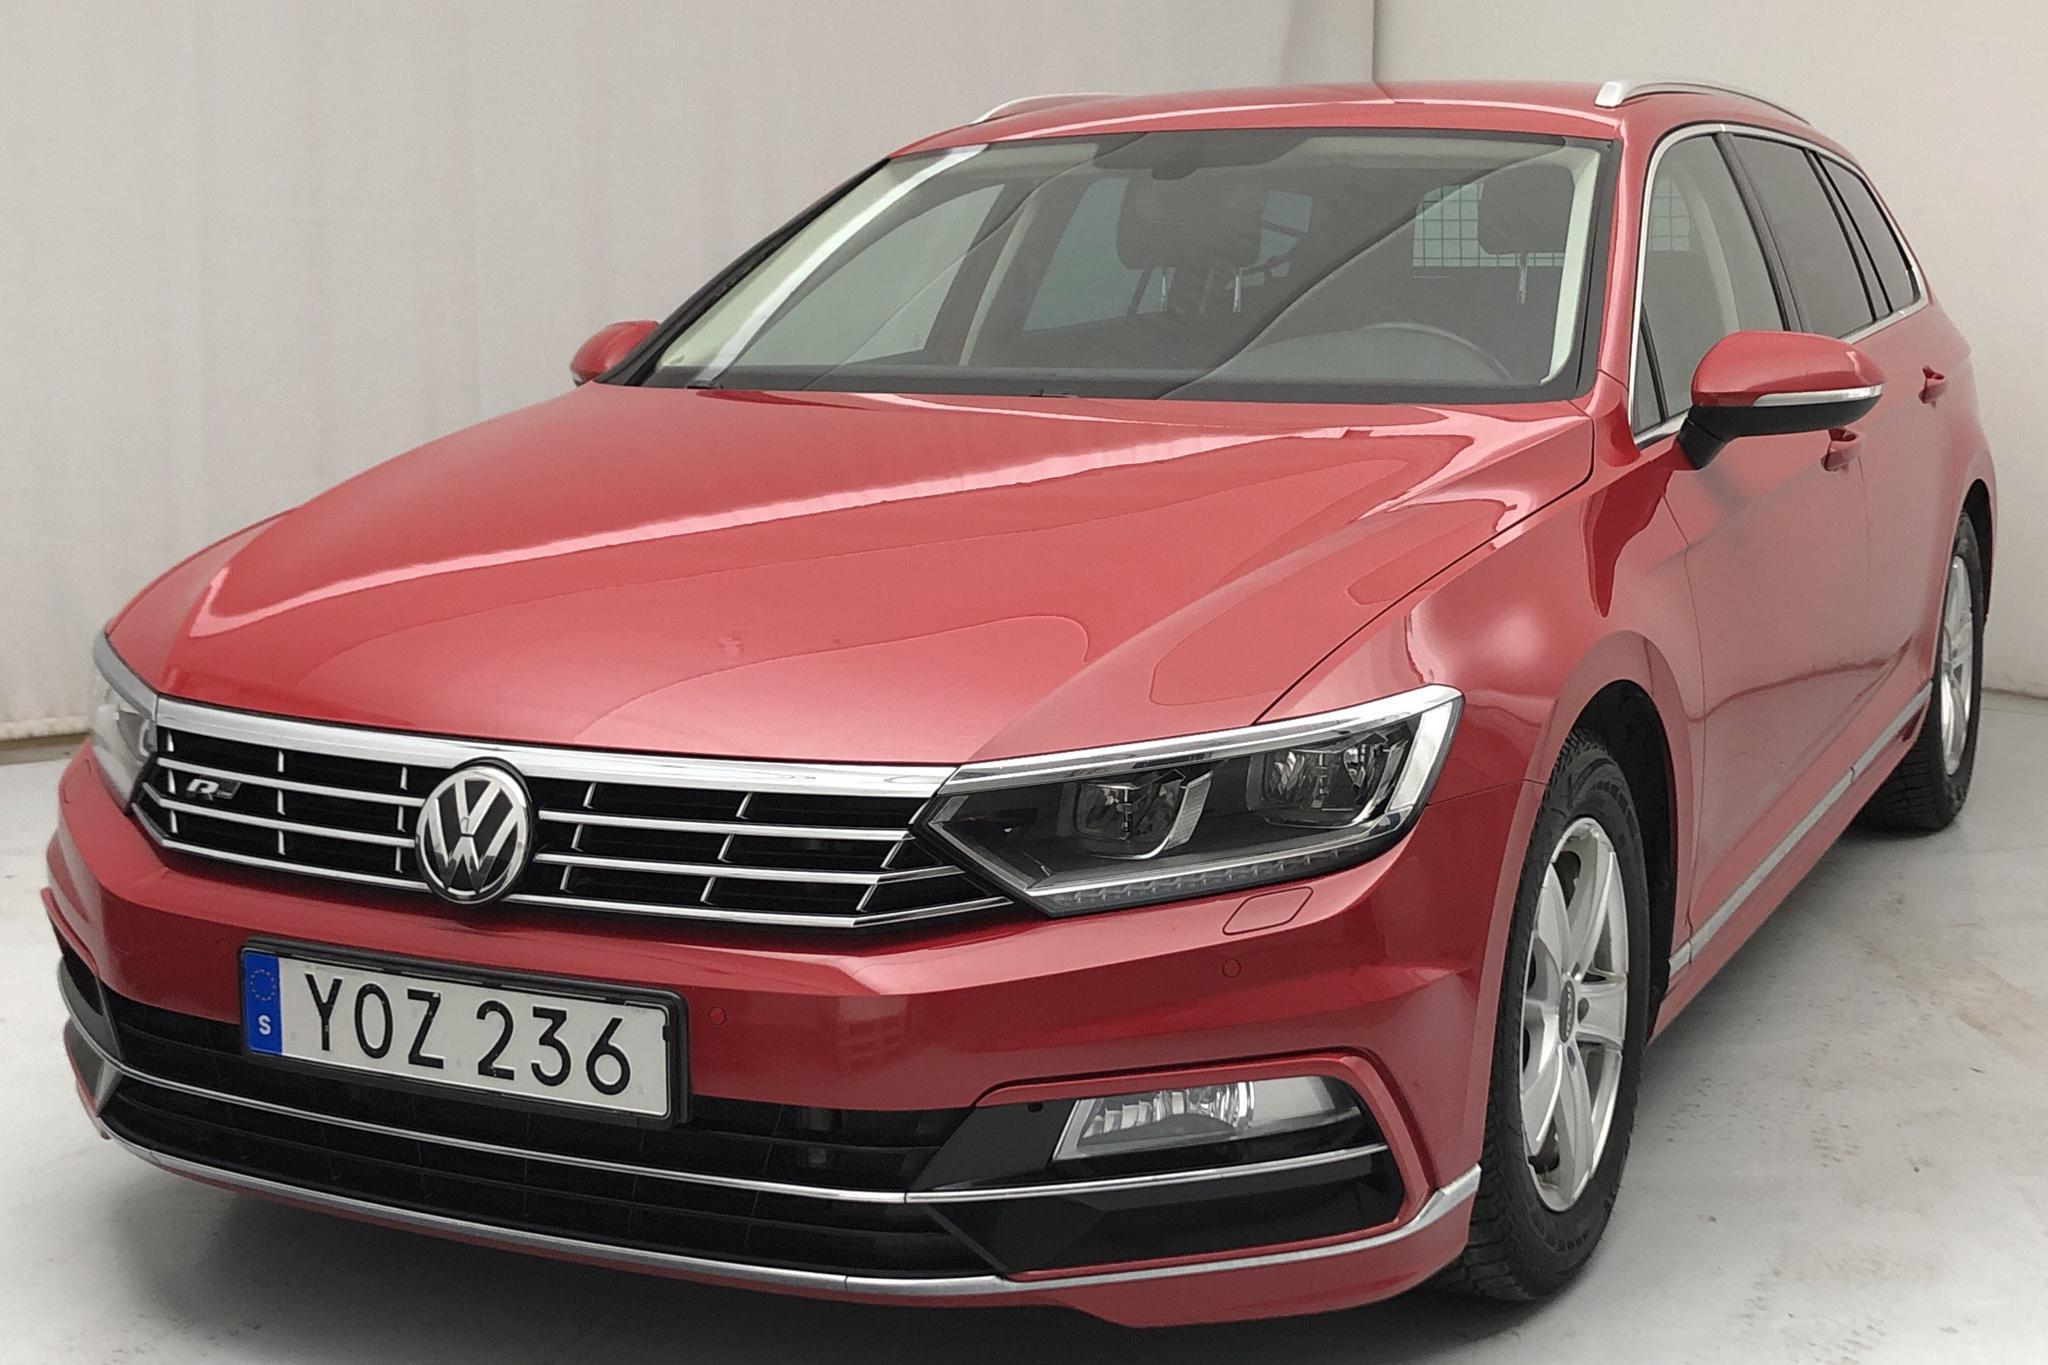 VW Passat 2.0 TDI Sportscombi (190hk) - 10 663 mil - Automat - röd - 2018